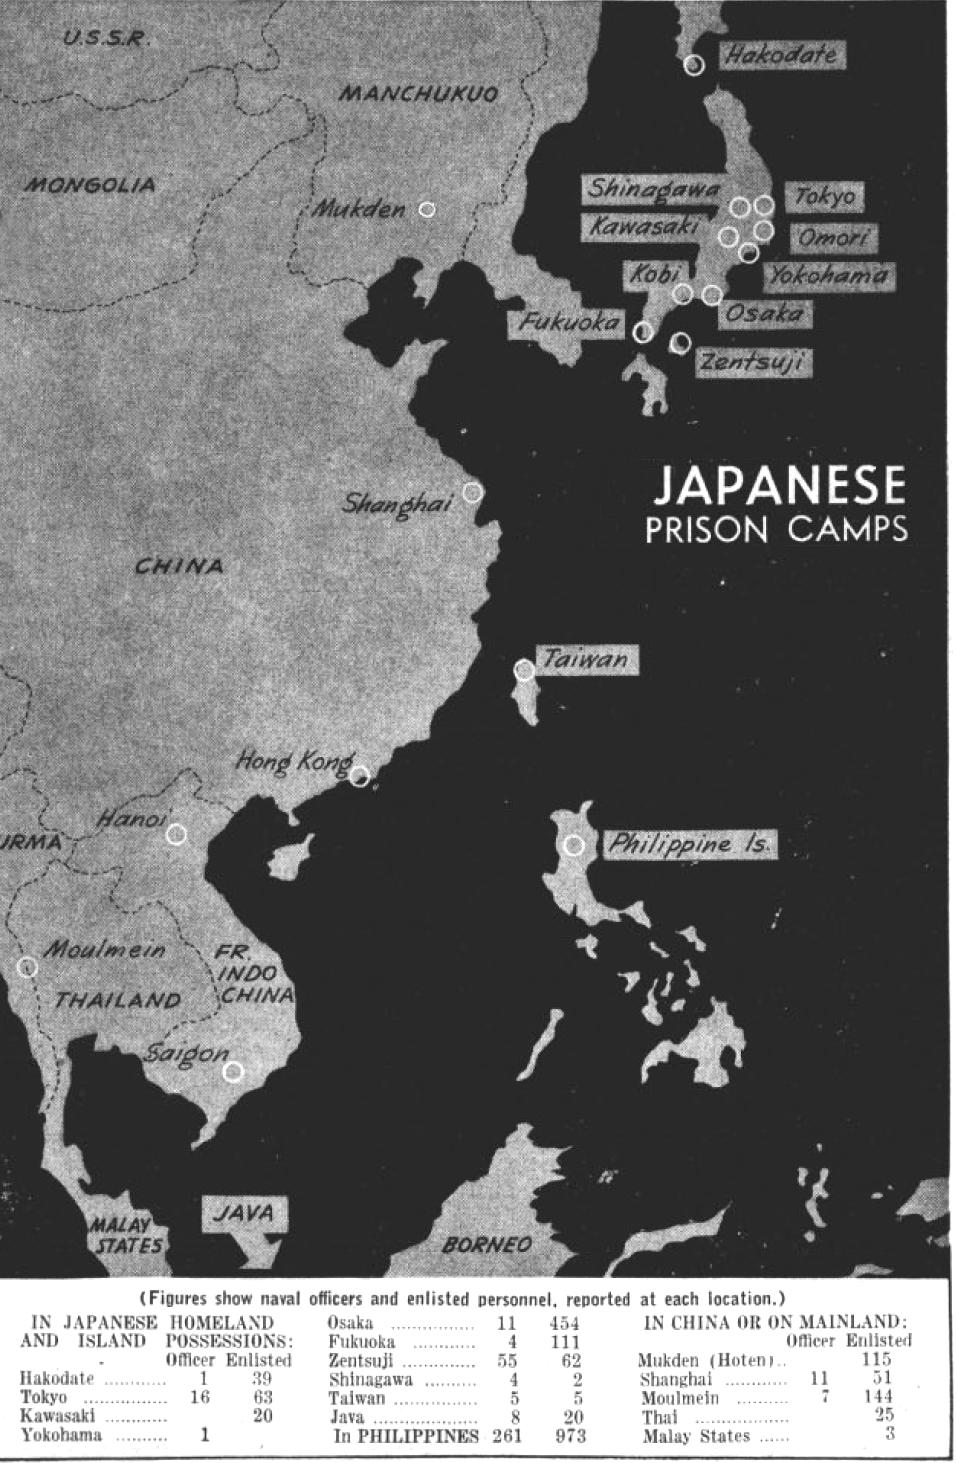 Fileprisoners of war camps in japan in world war ii map of 1944 fileprisoners of war camps in japan in world war ii map of 1944 gumiabroncs Images